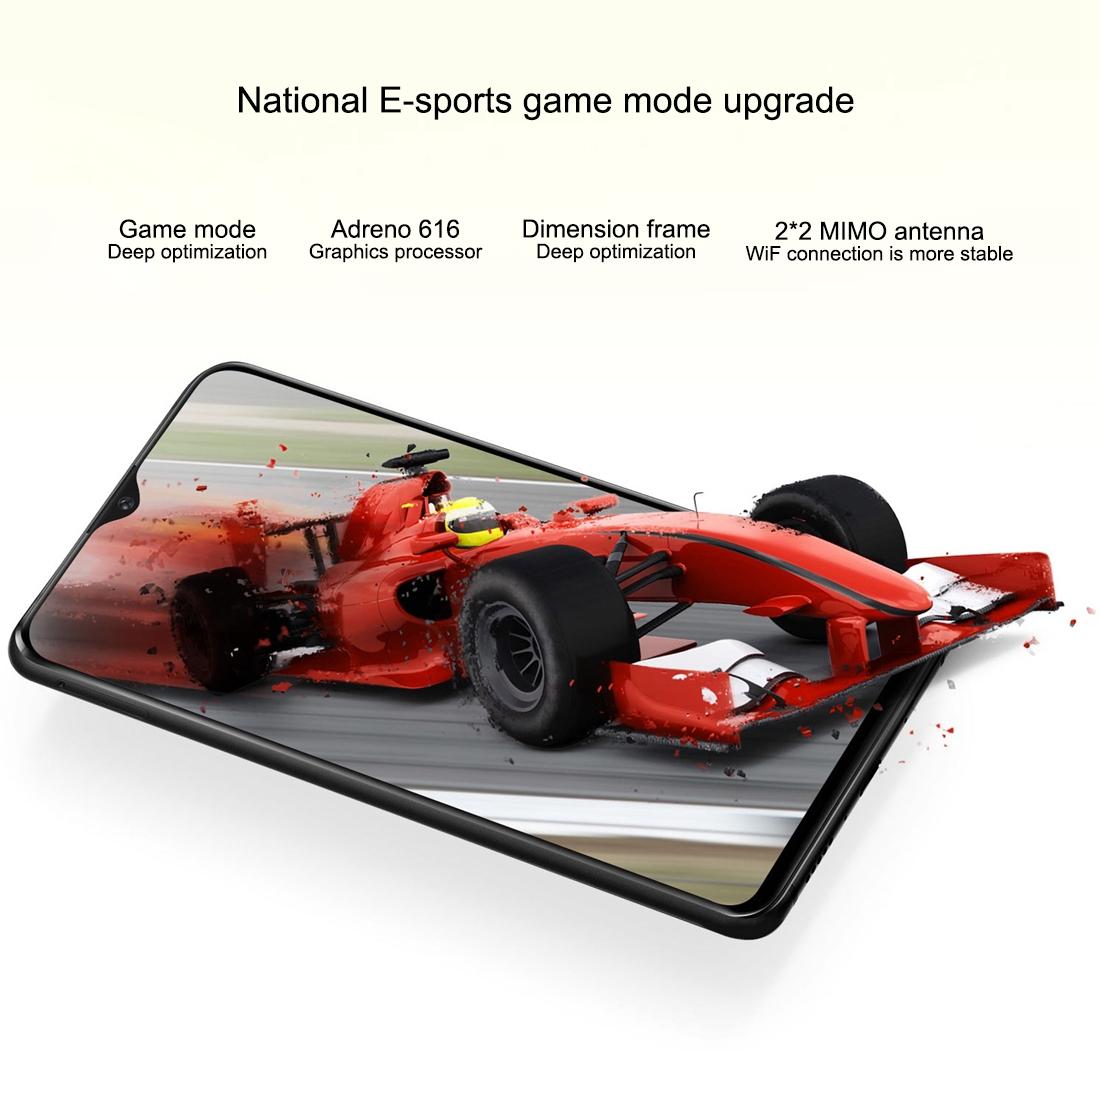 i.ibb.co/qdR2dBv/Smartphone-6-GB-de-RAM-128-GB-de-ROM-Lenovo-Z5s-8.jpg